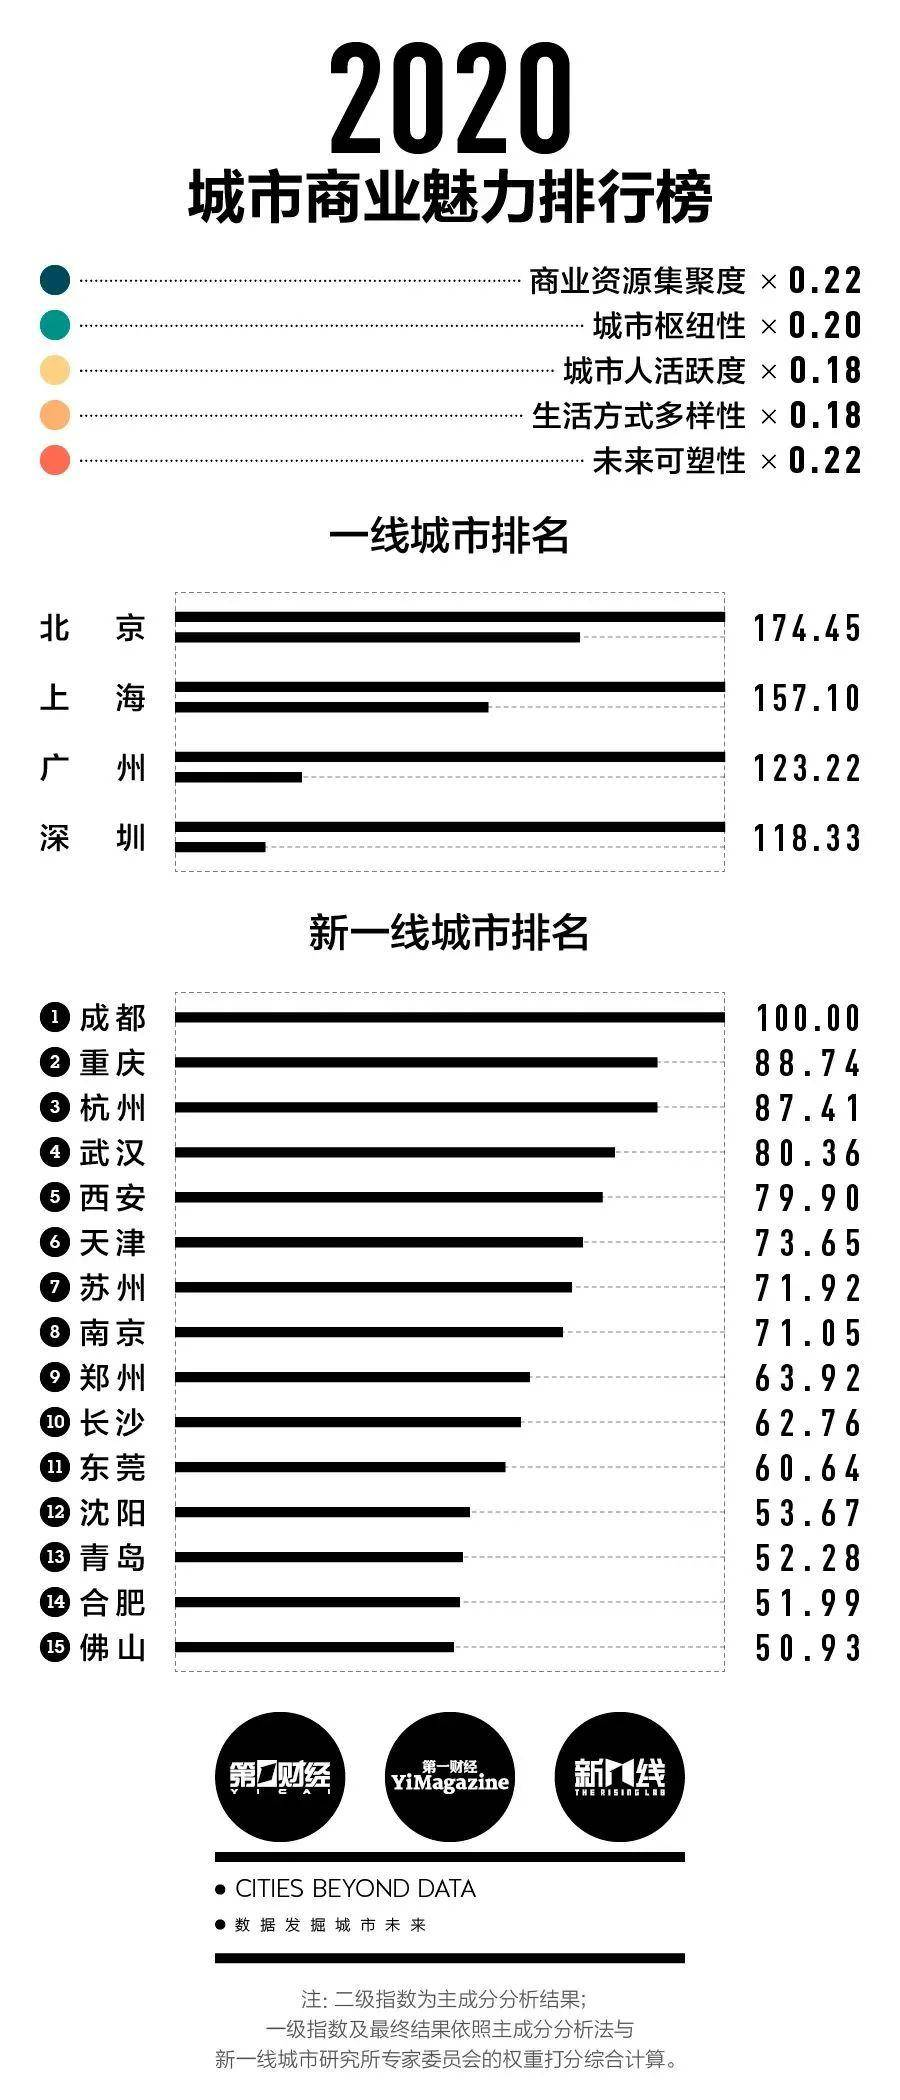 http://www.880759.com/tiyuhuodong/24379.html